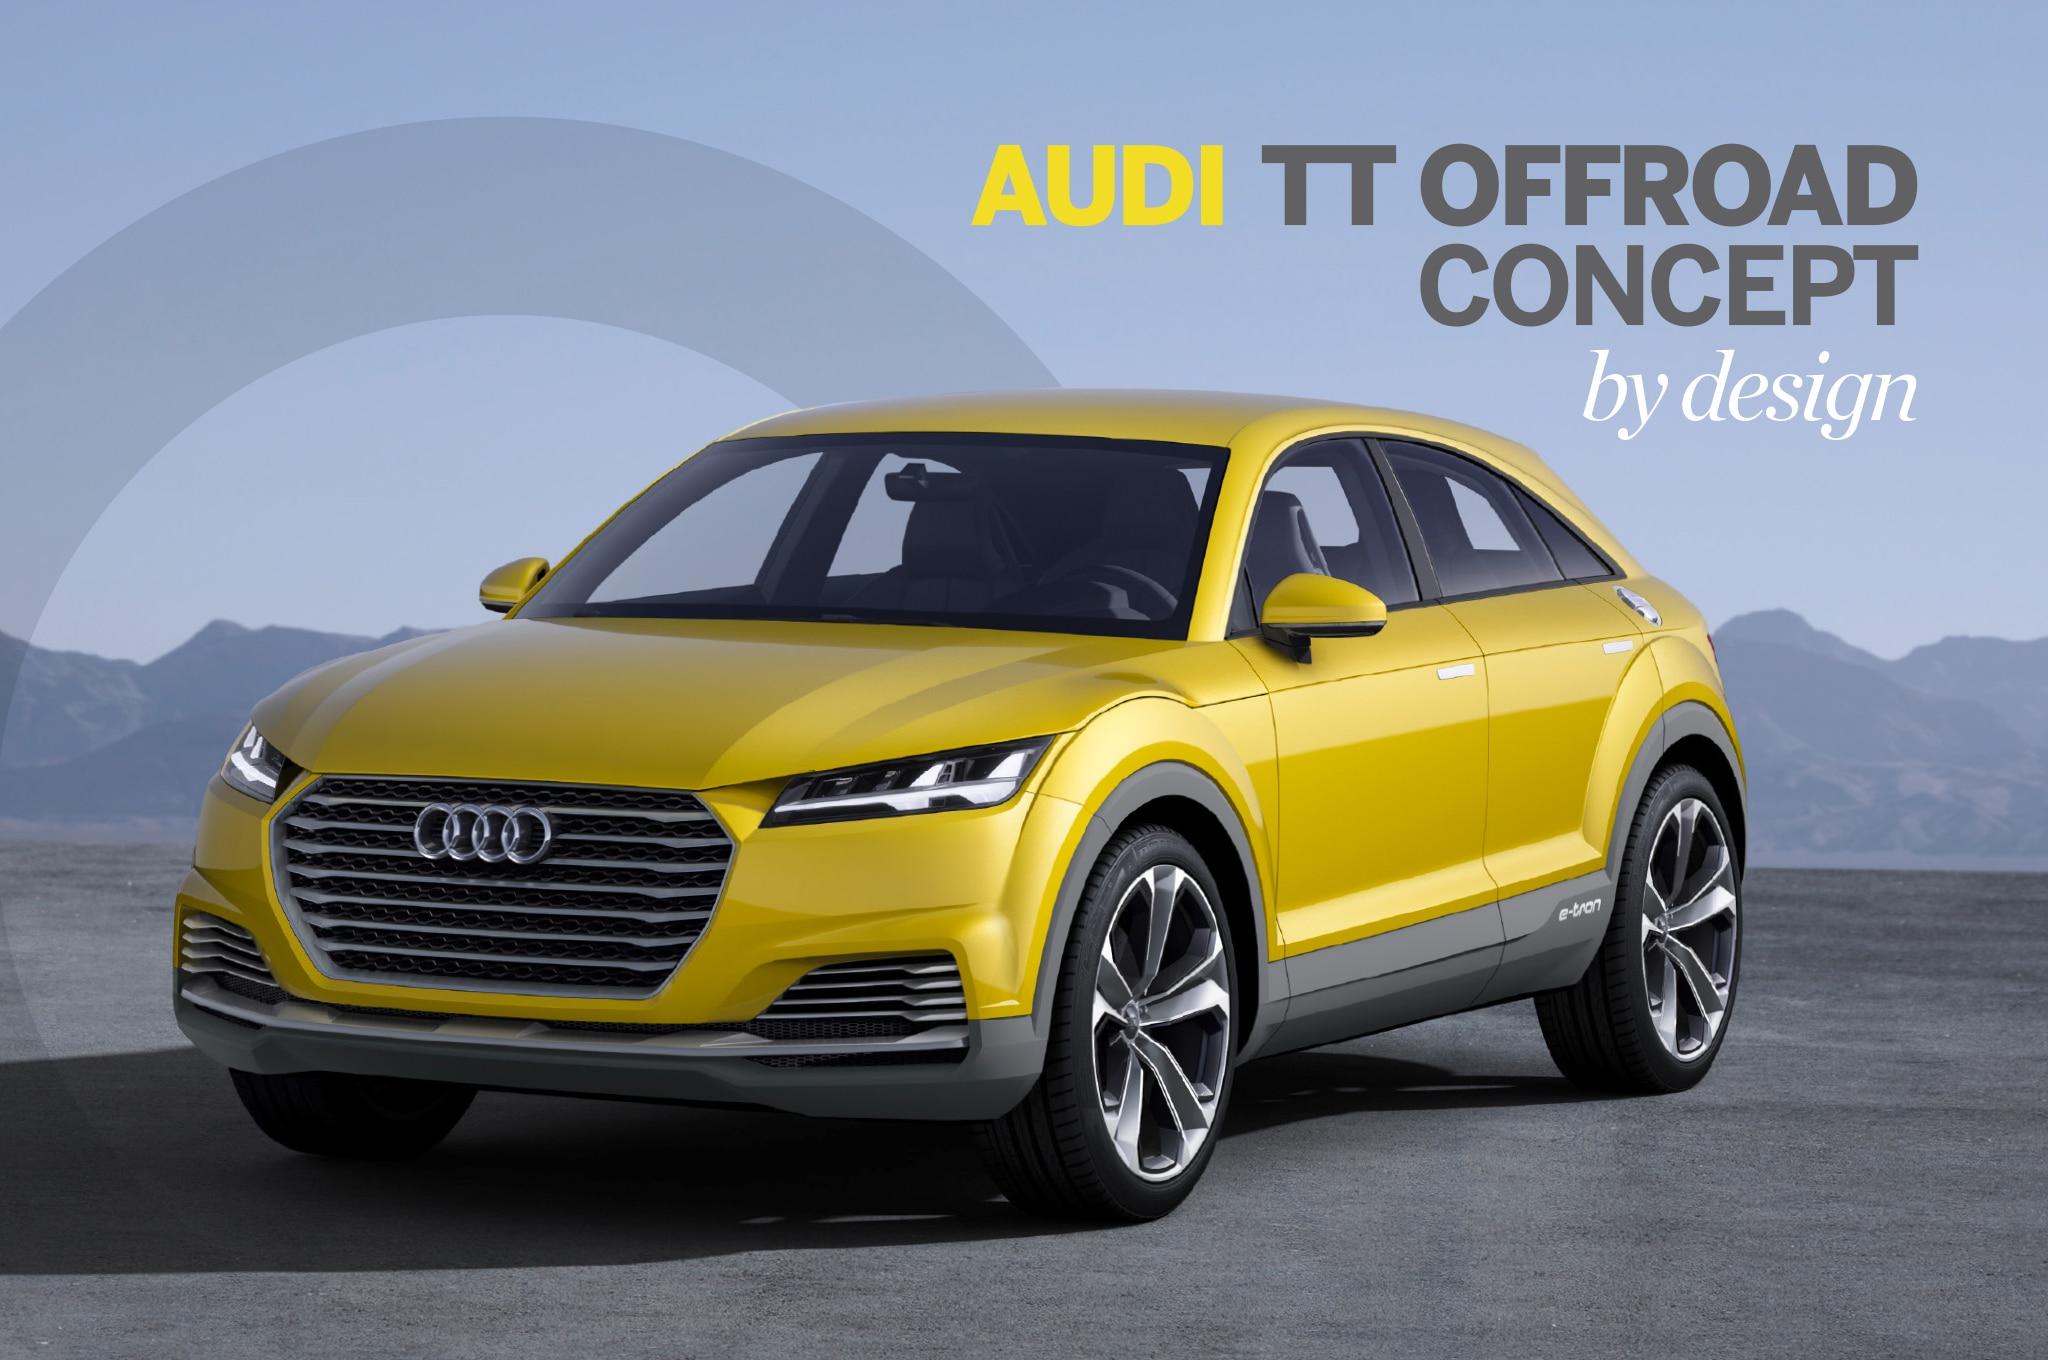 Audi TT Offroad Concept Lead